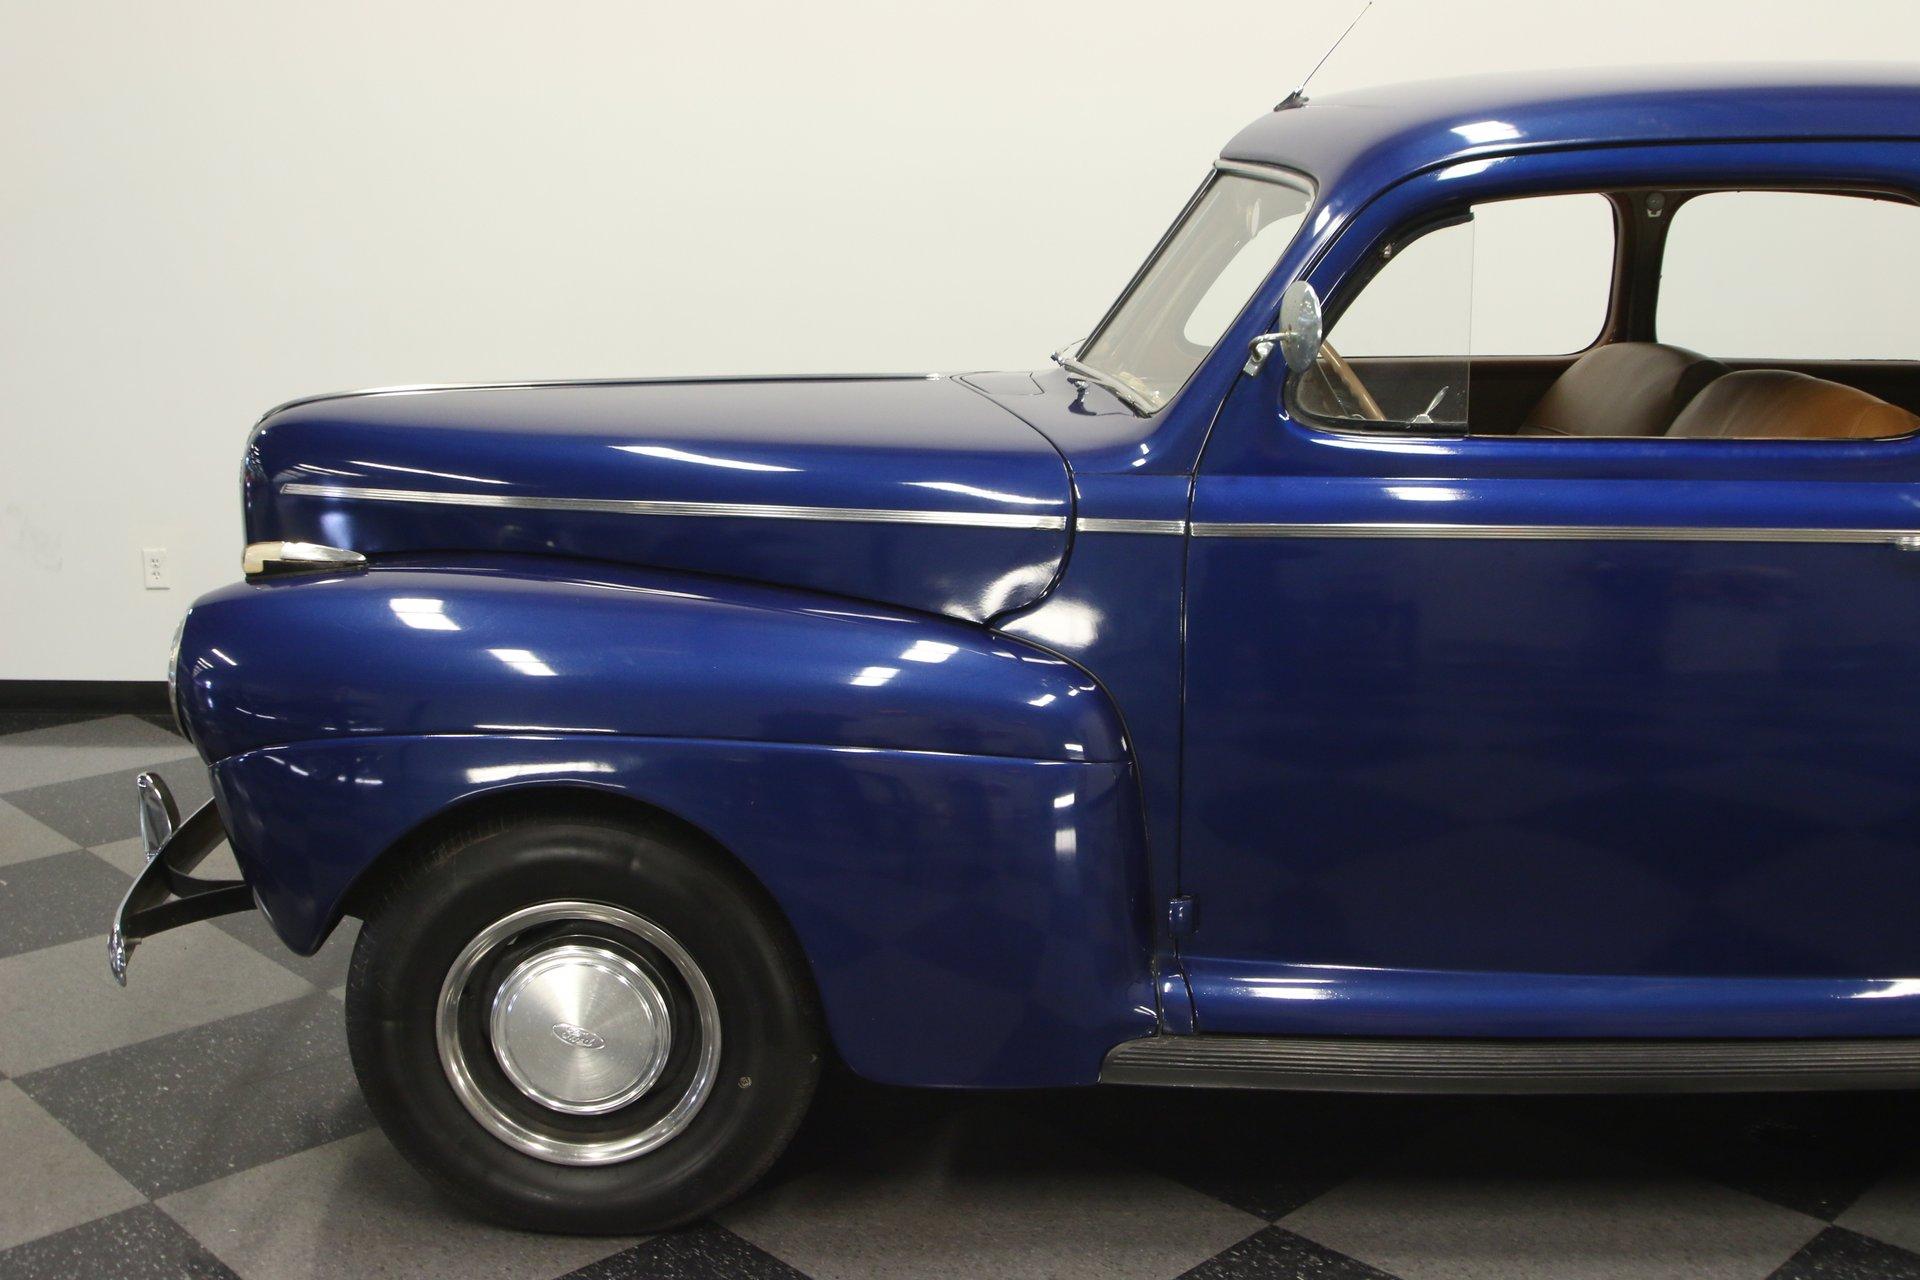 1941 Ford Streetside Classics The Nations Trusted Classic Car Mercury Flathead Engine View 360